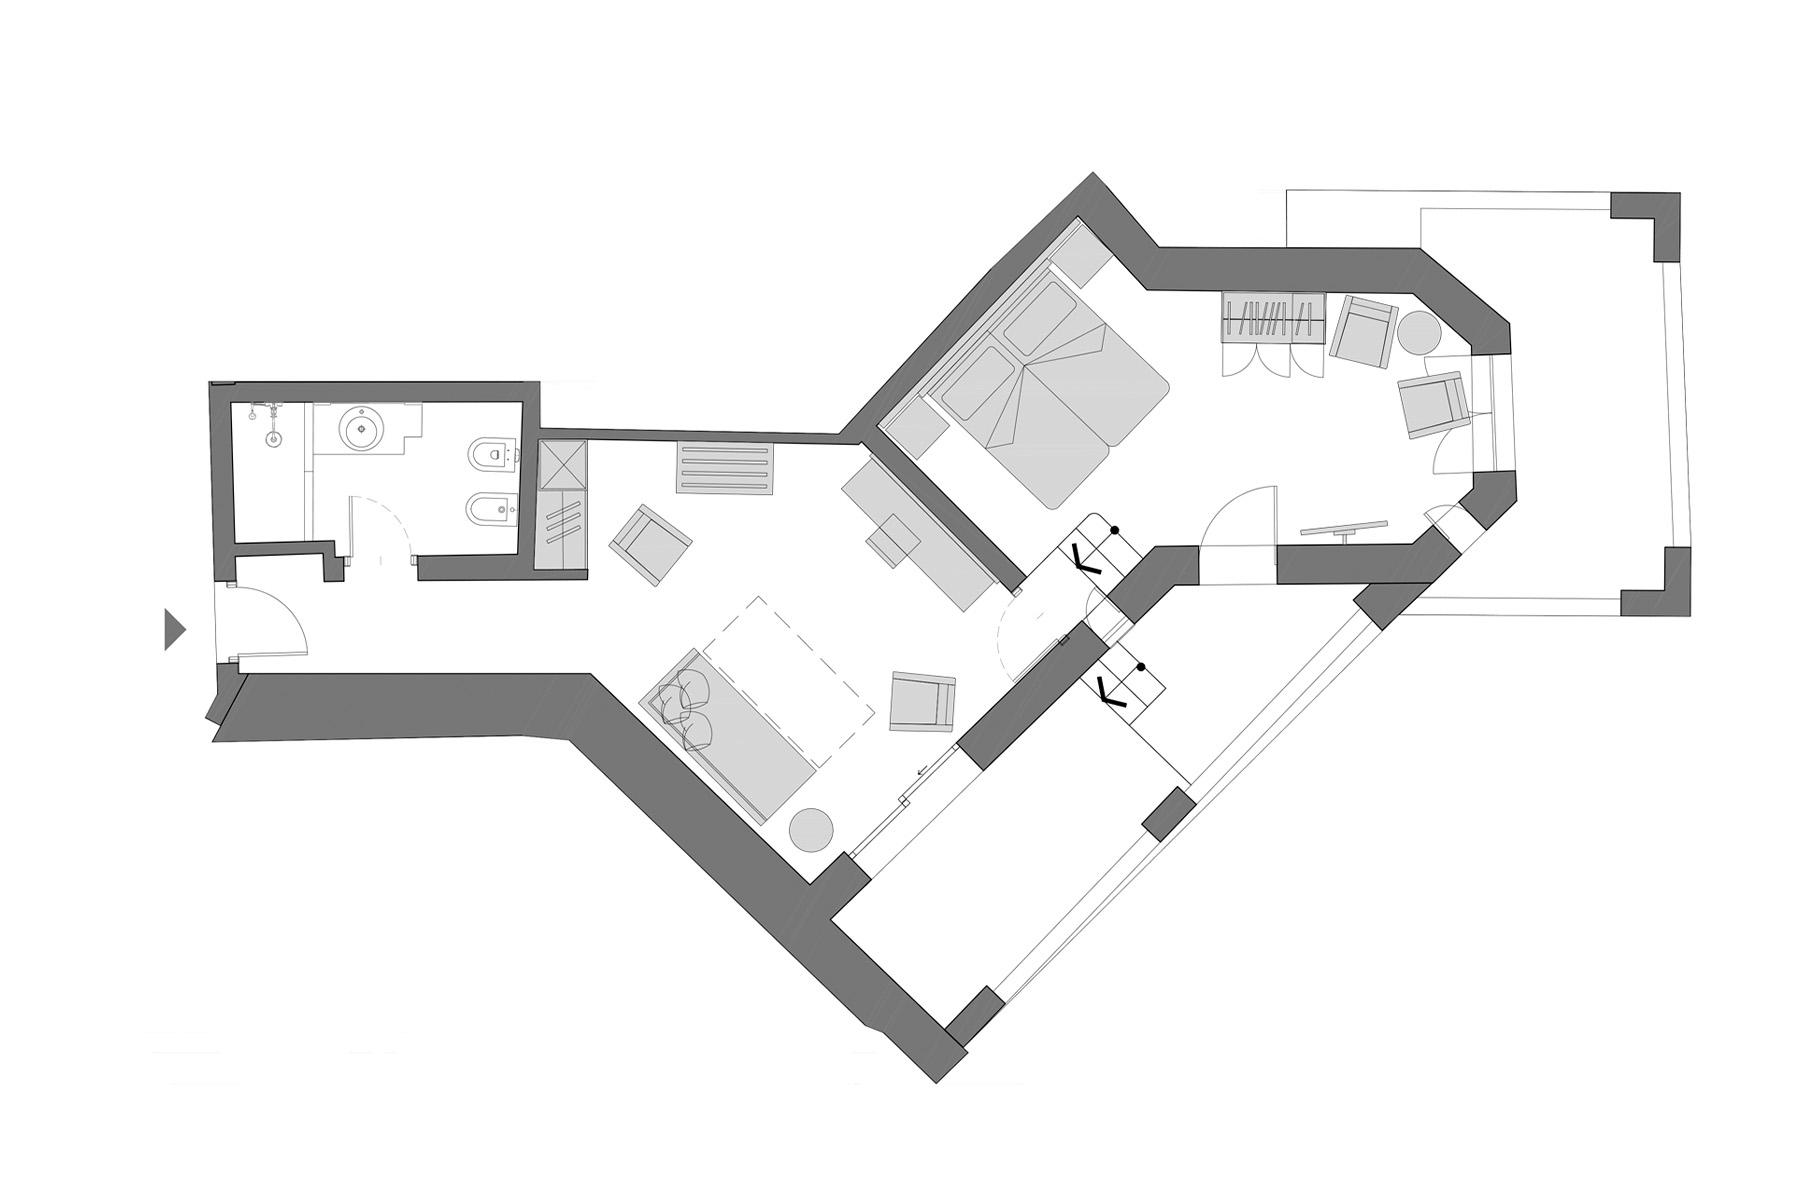 planimetria deluxe suite